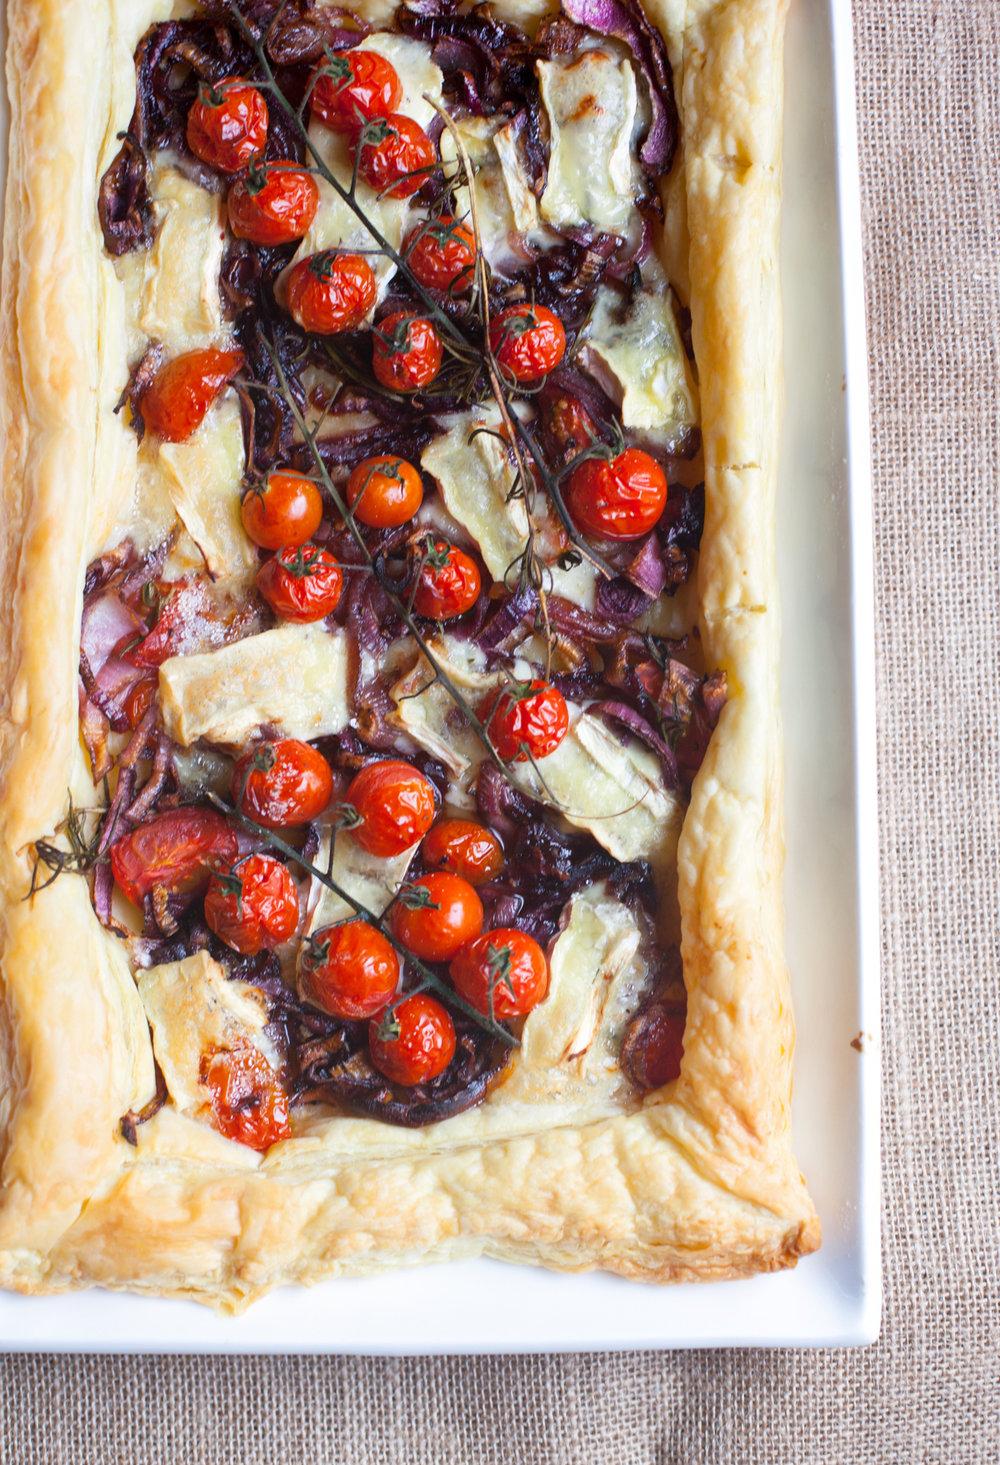 Caramelised-Onion-Brie-Cherry-Tomato-Tart-9604.jpg